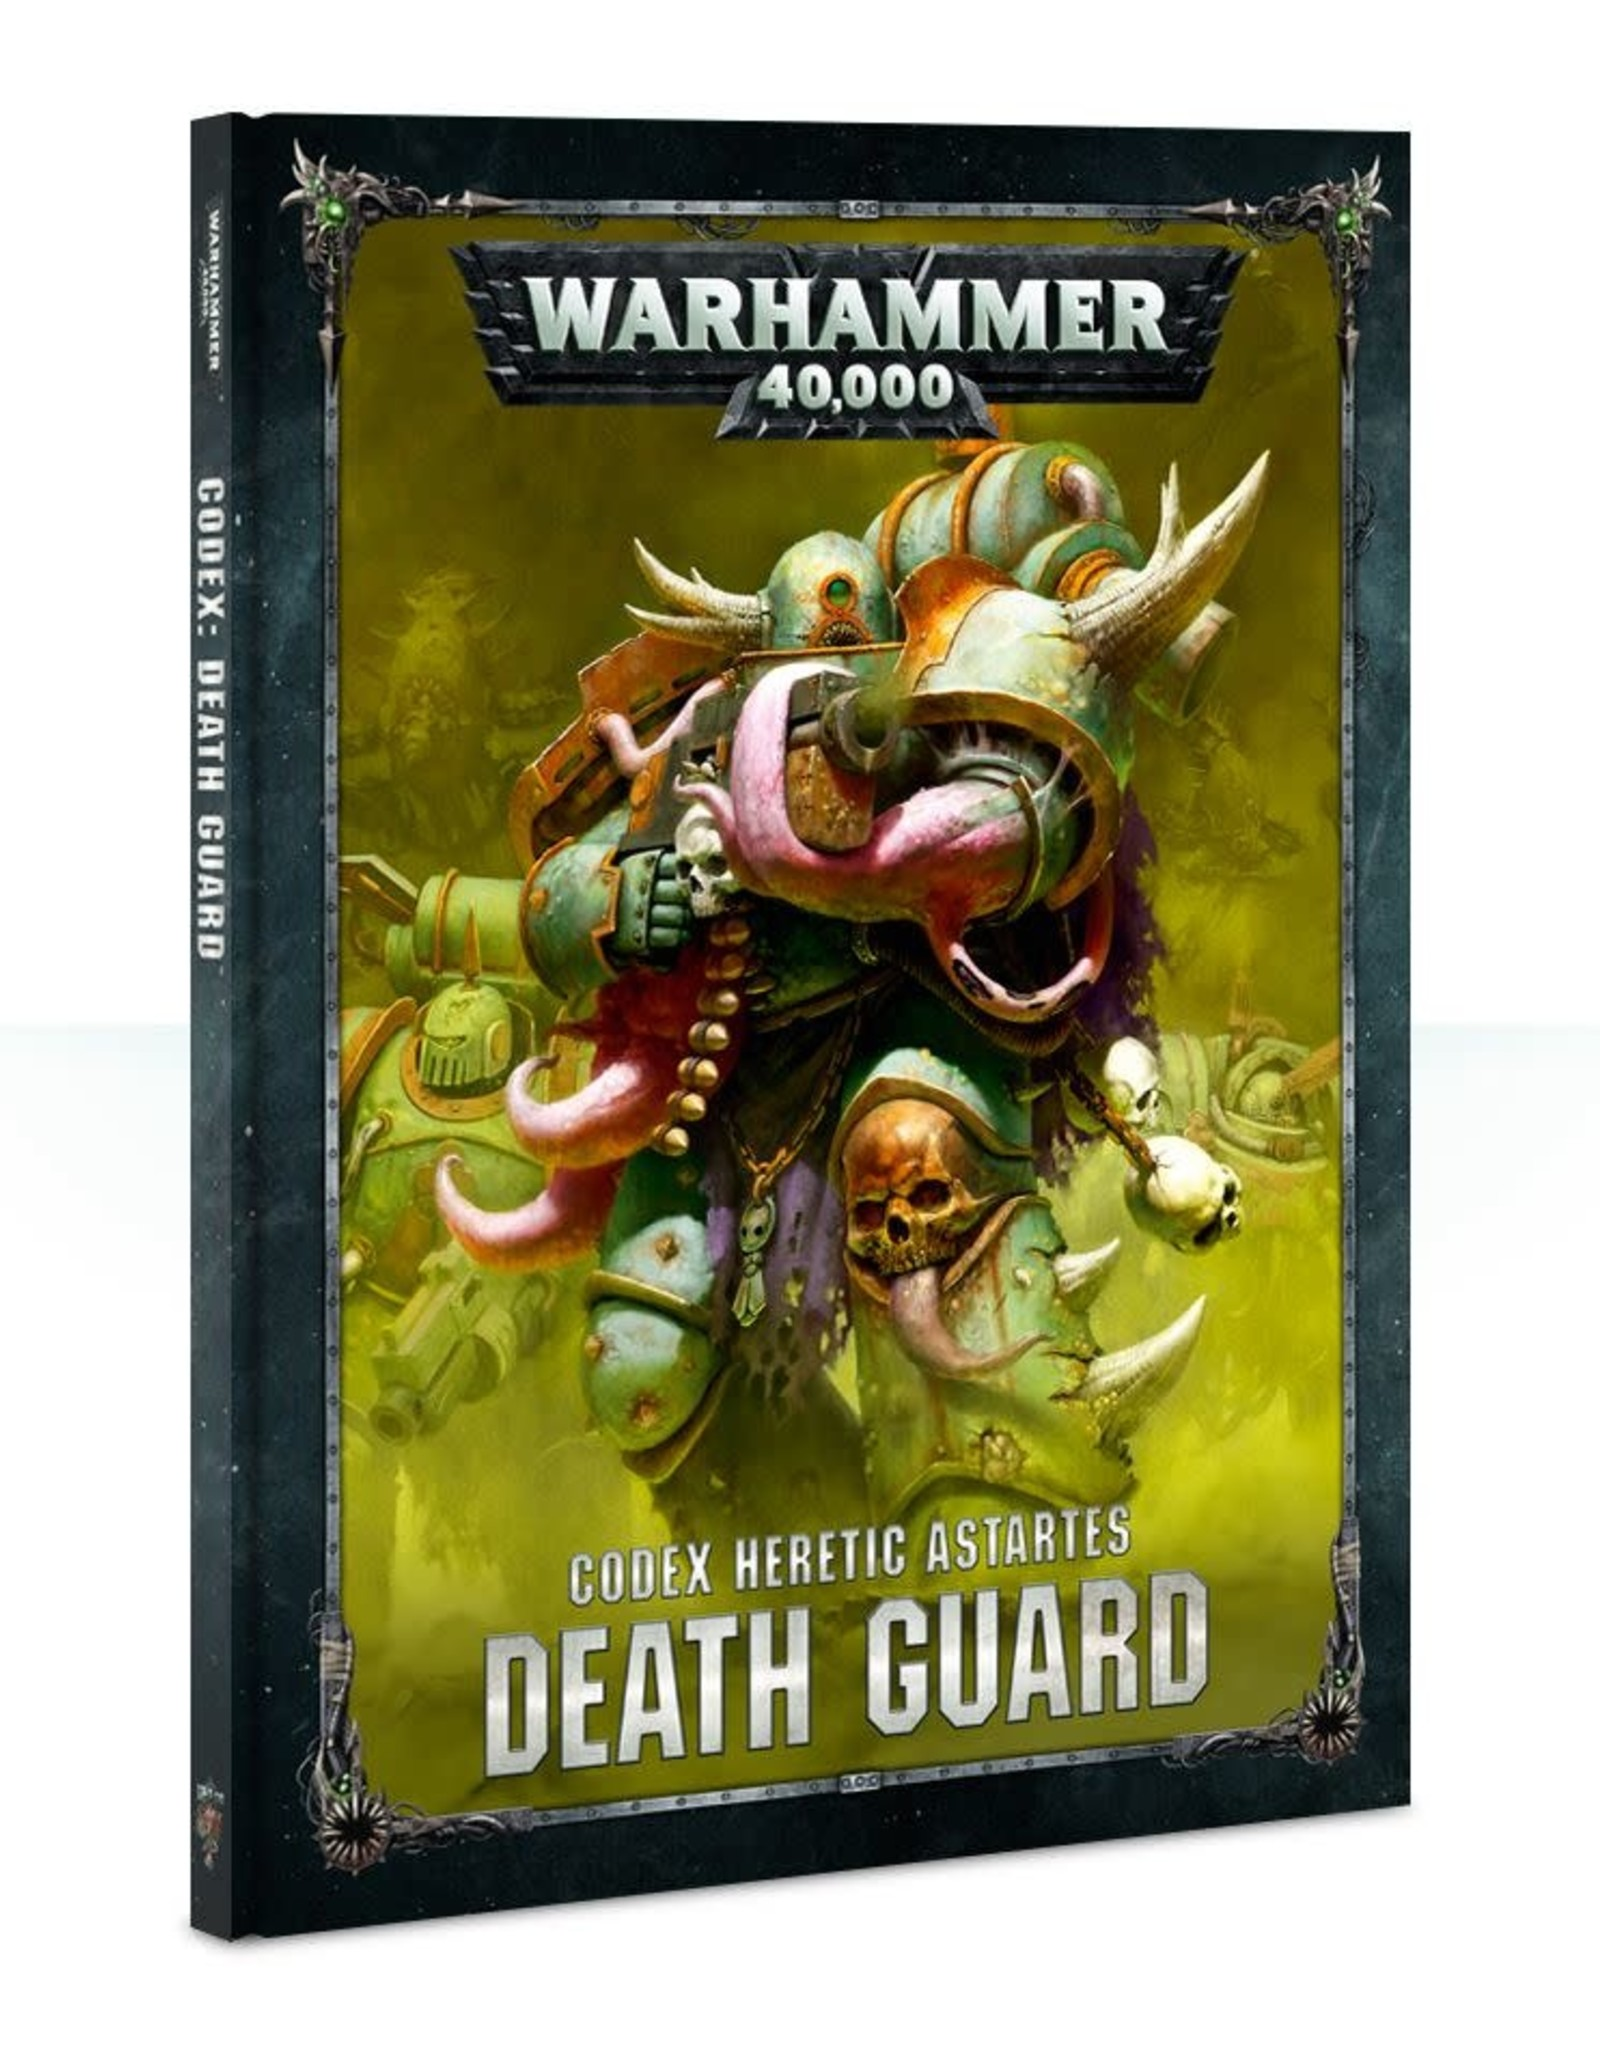 Warhammer 40K Codex: Death Guard